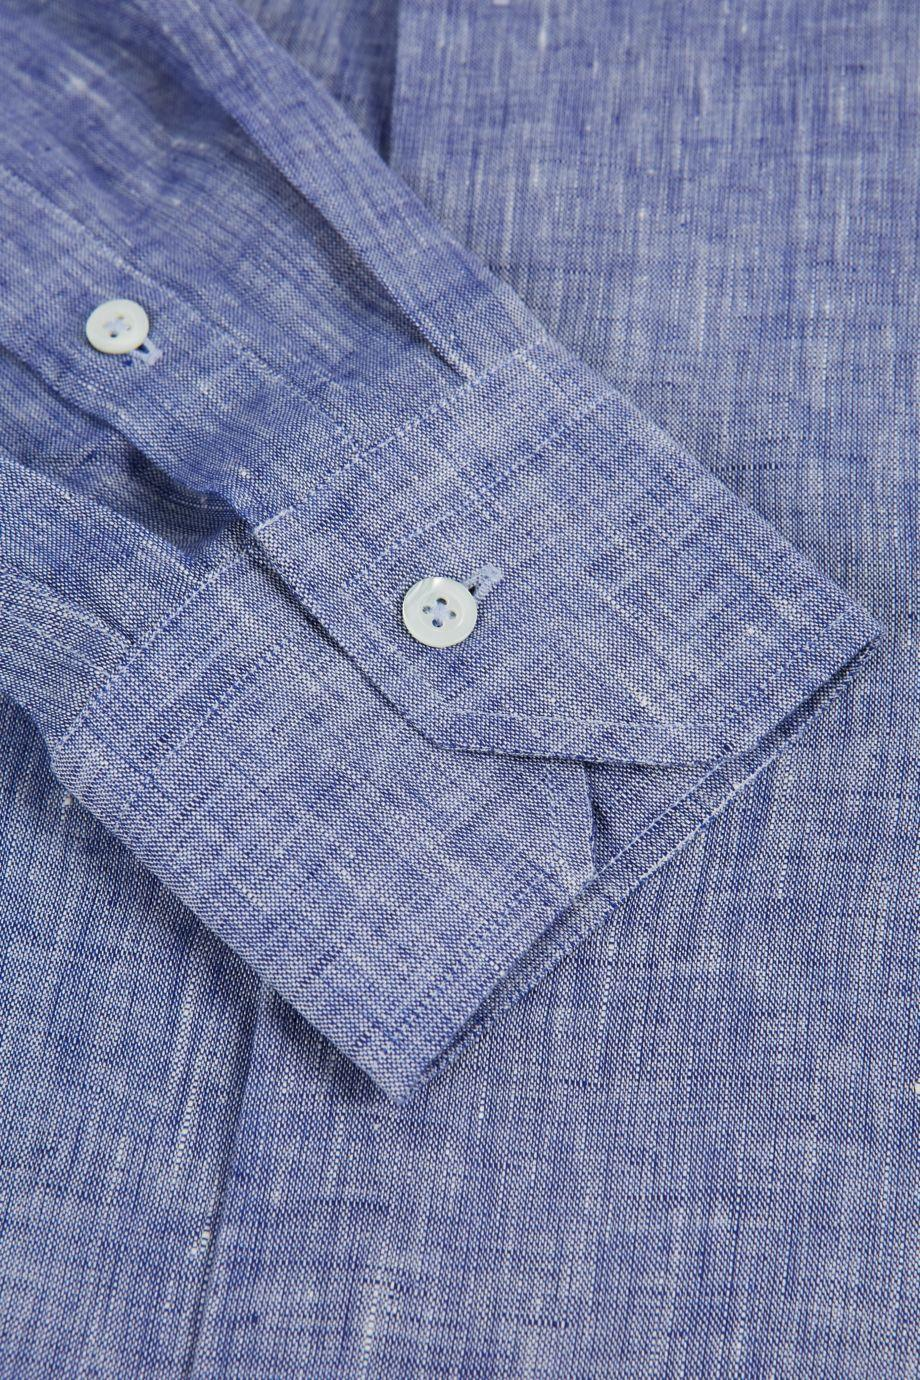 FRESCOBOL CARIOCA Slim-Fit Linen Button-Up Shirt in Blue